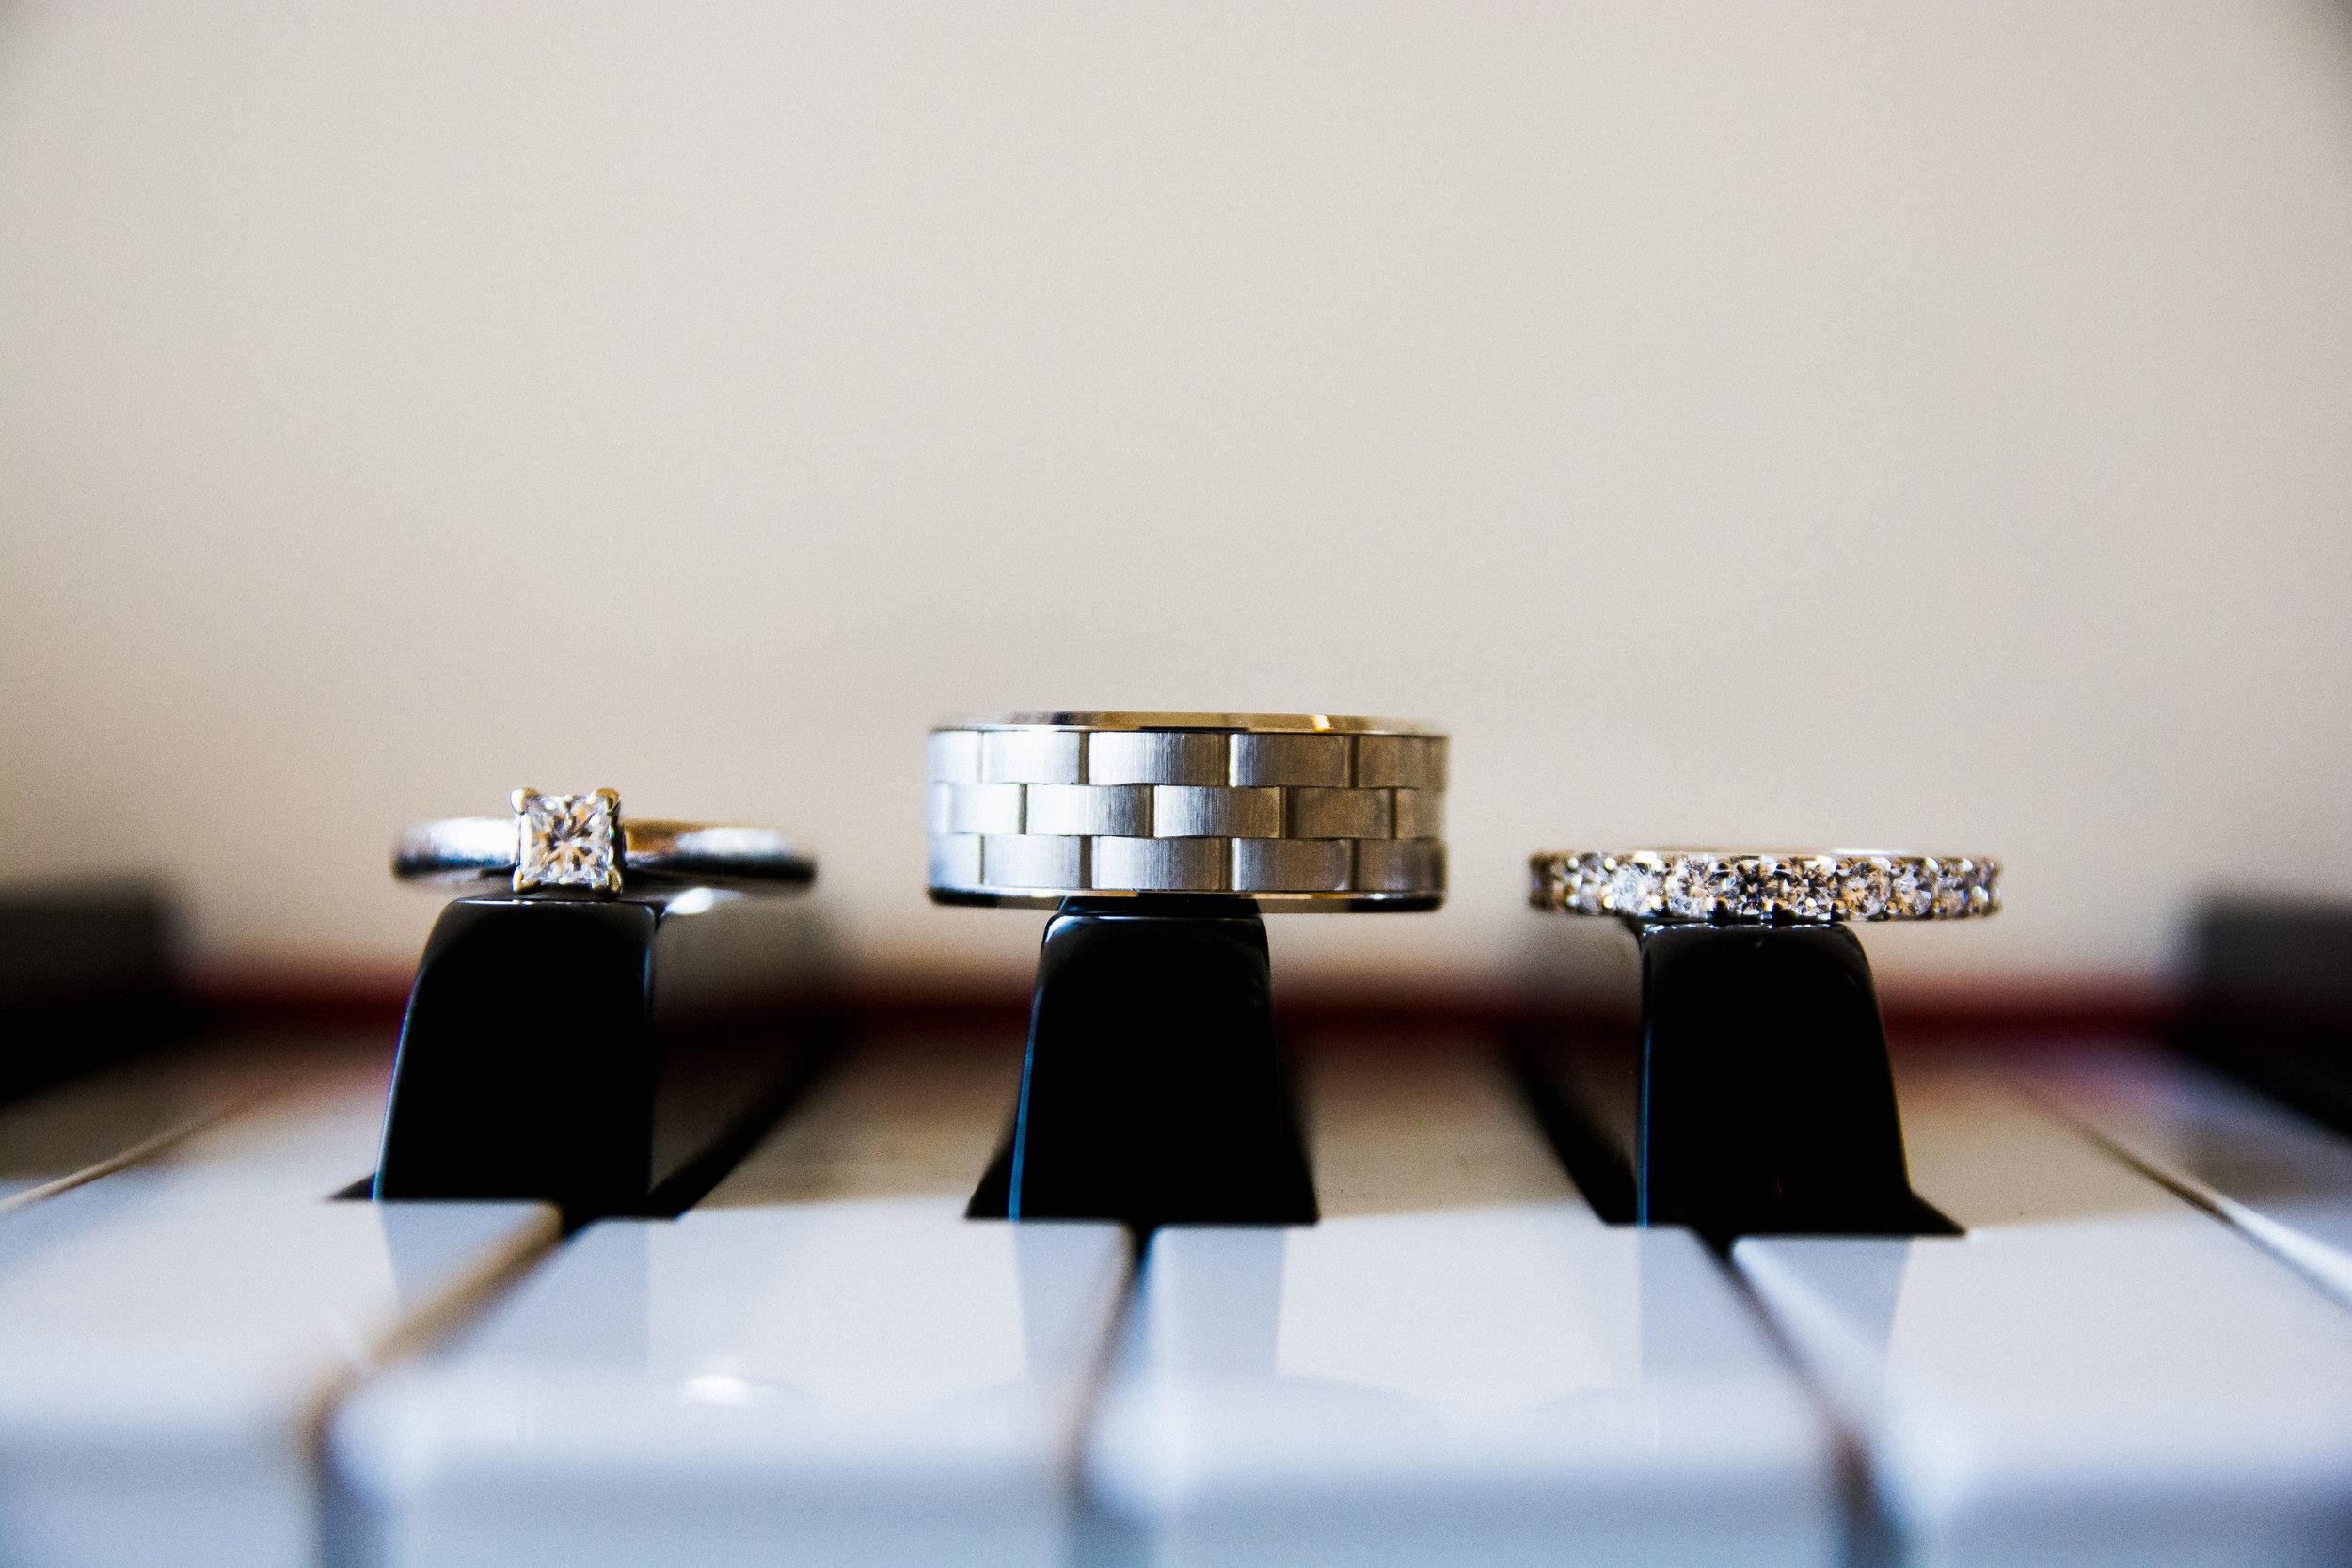 Imani J Portraits_Wedding Photographer_Melbourne Florida_Hilton Rialto_rings (1 of 1).jpg